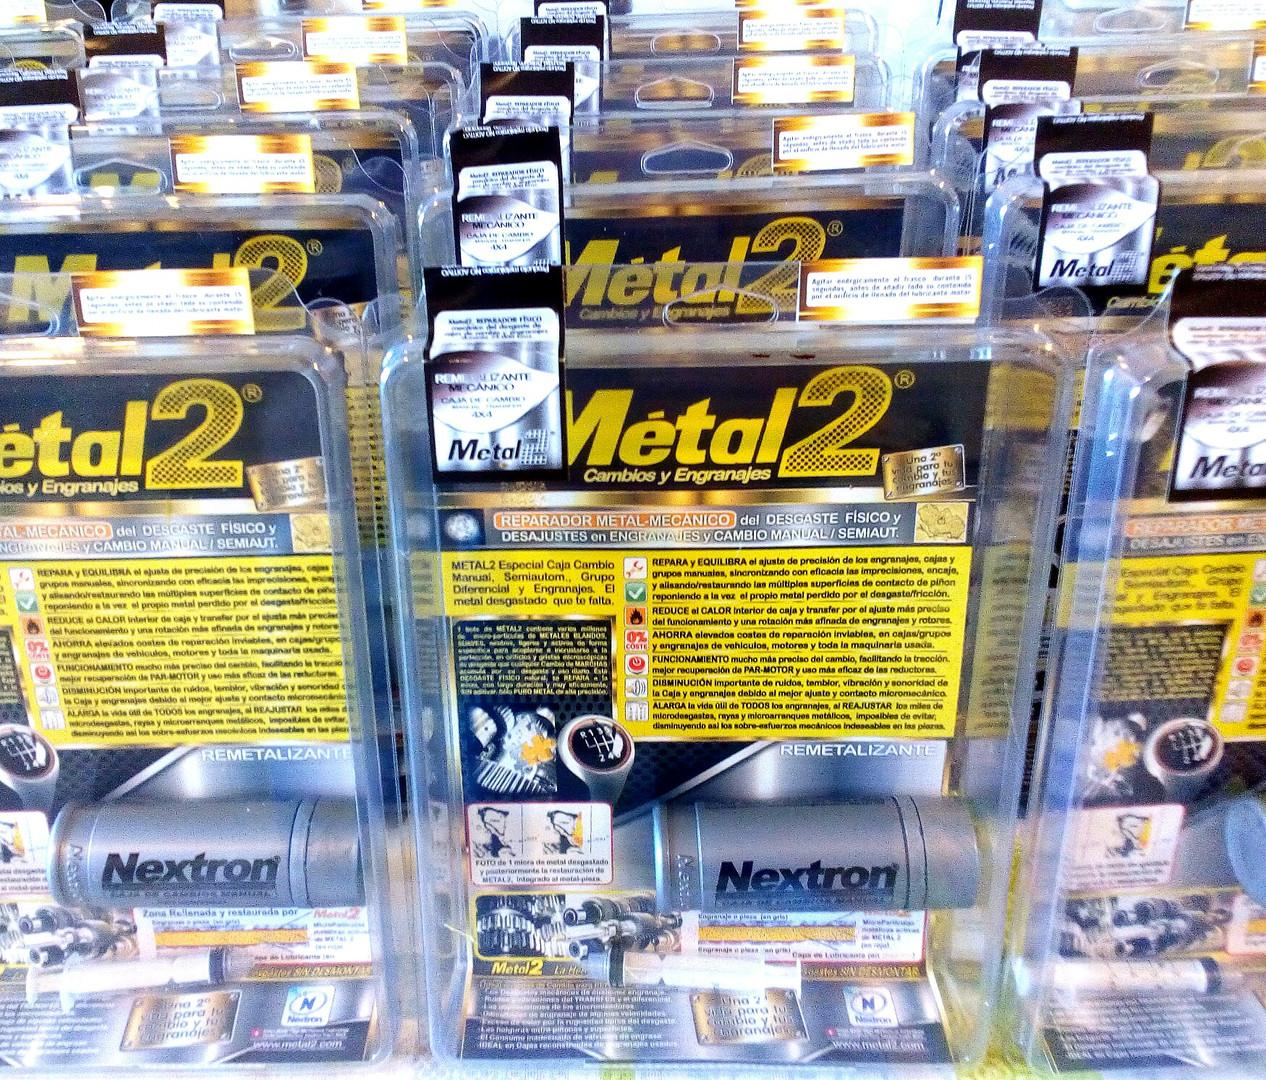 aditivo metal2 caja cambio.jpg